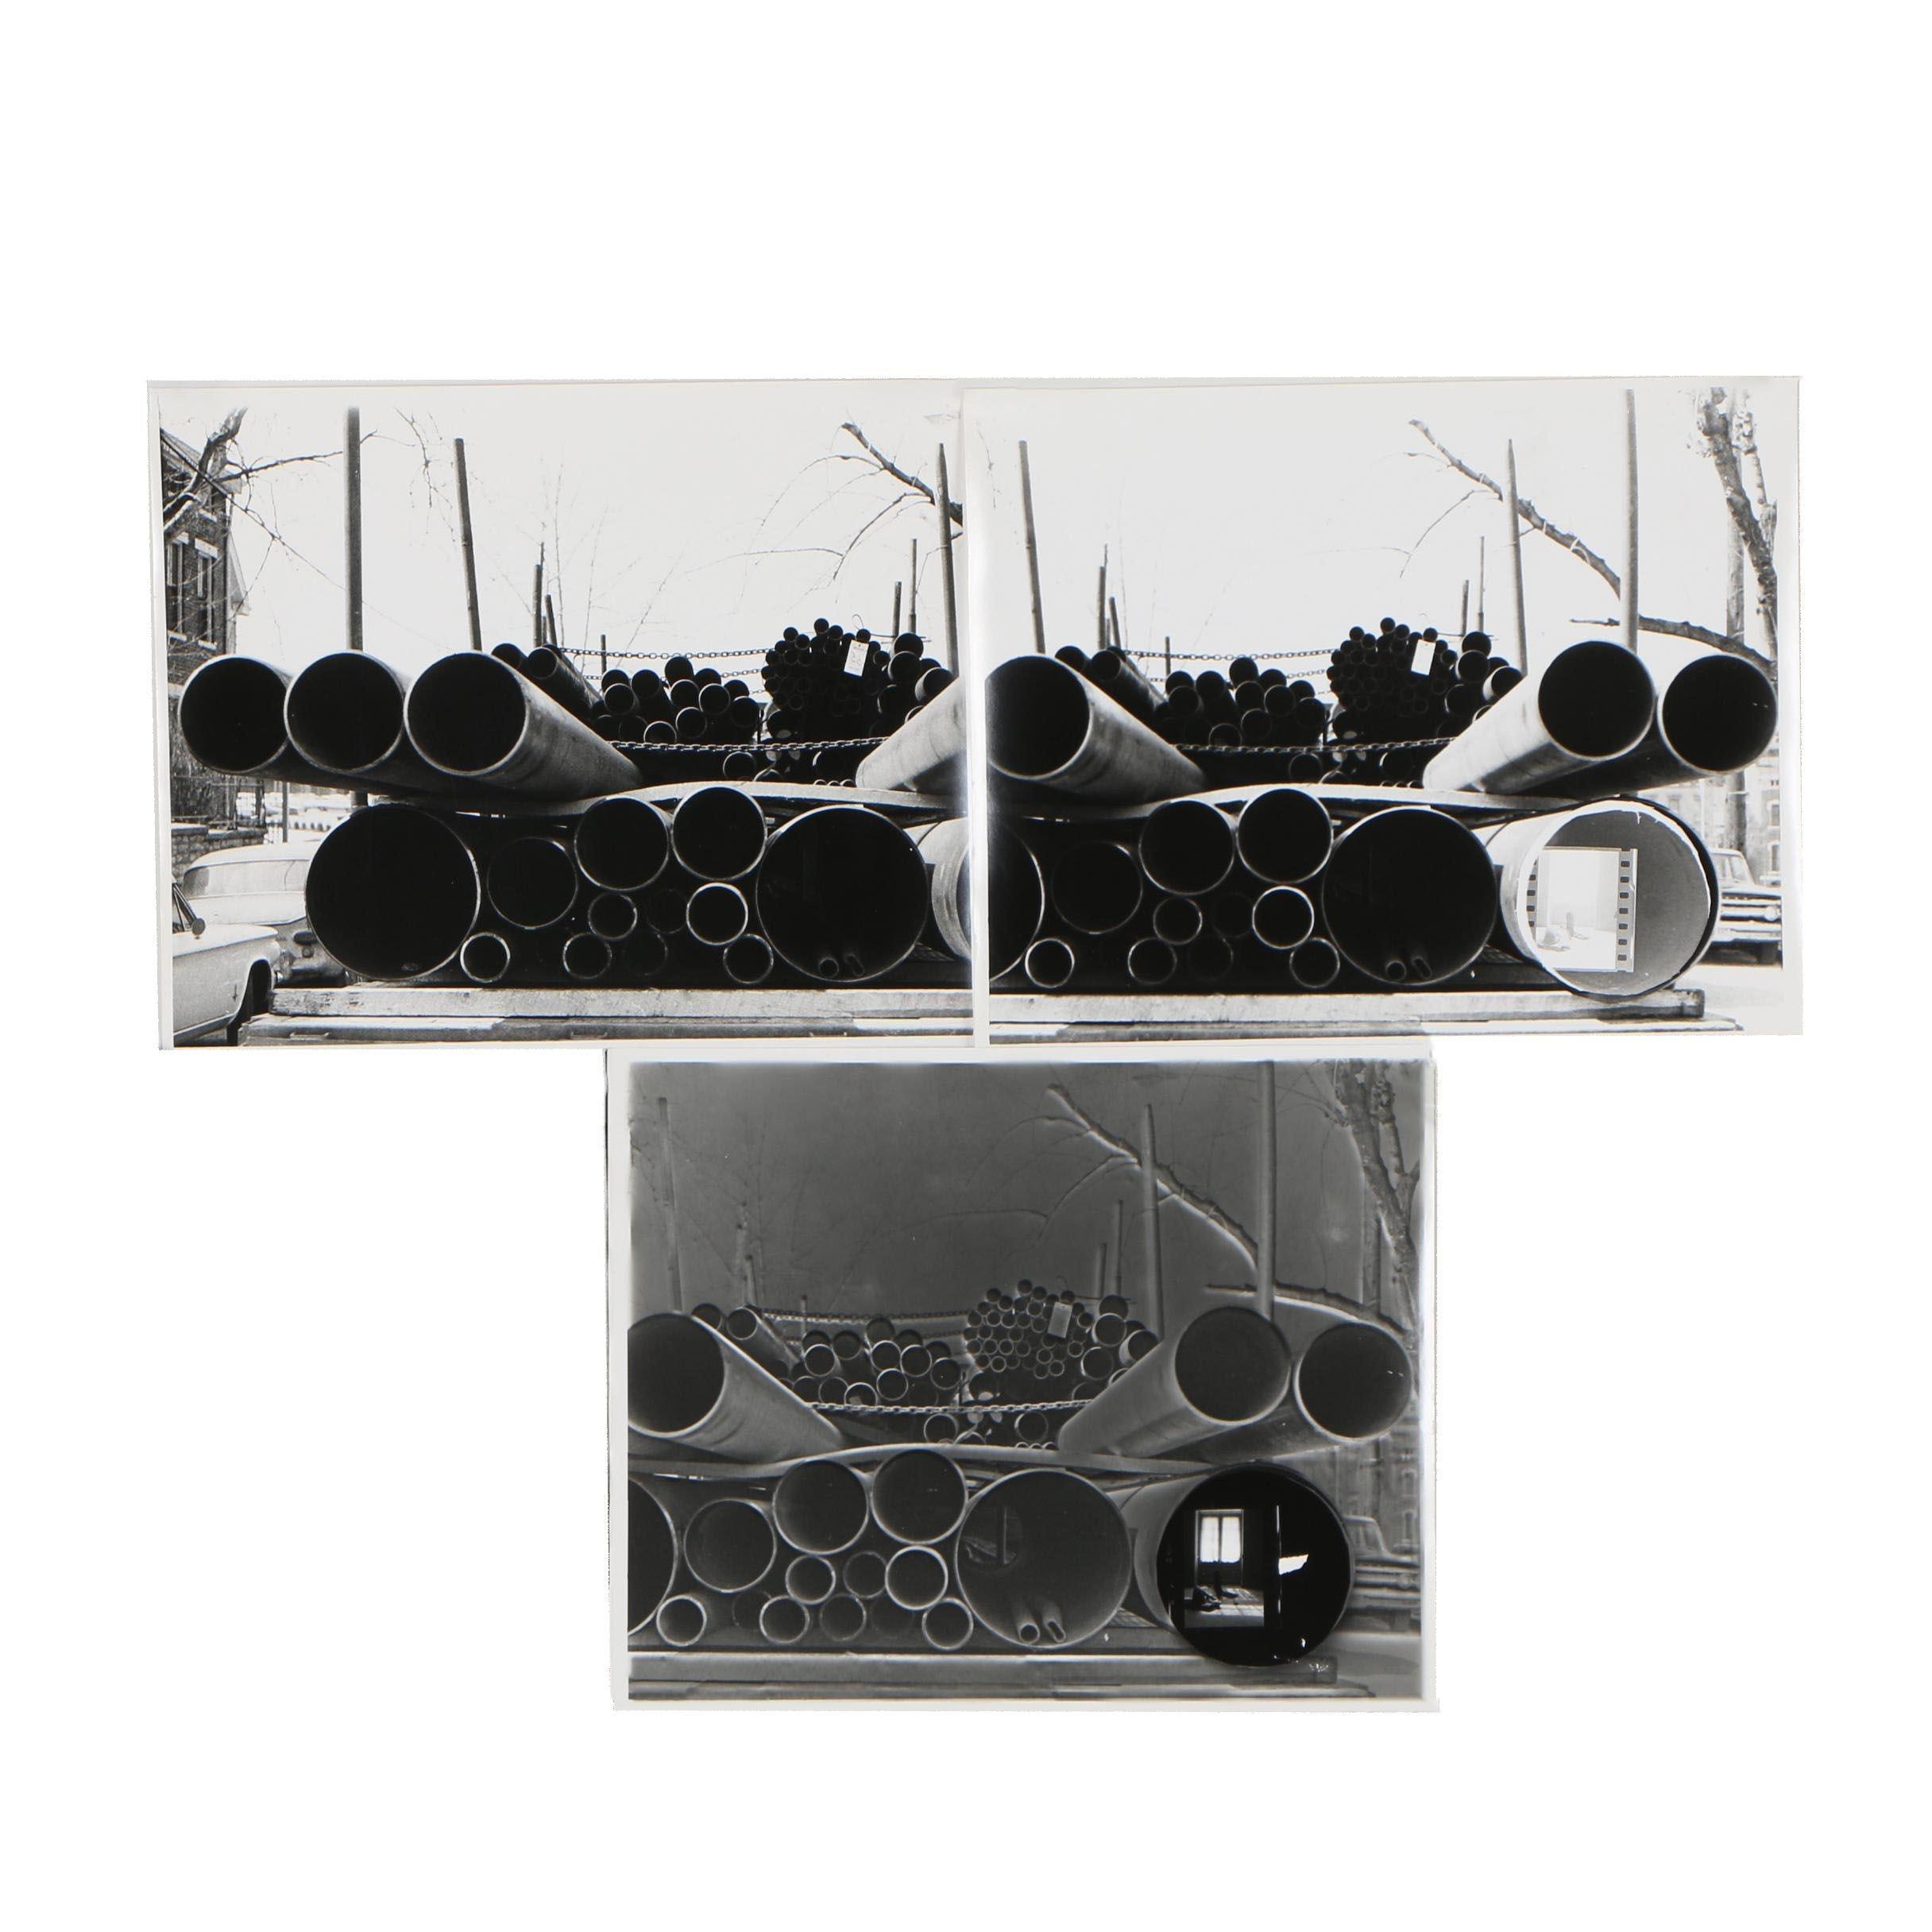 Merle Rosen Silver Gelatin Photographs